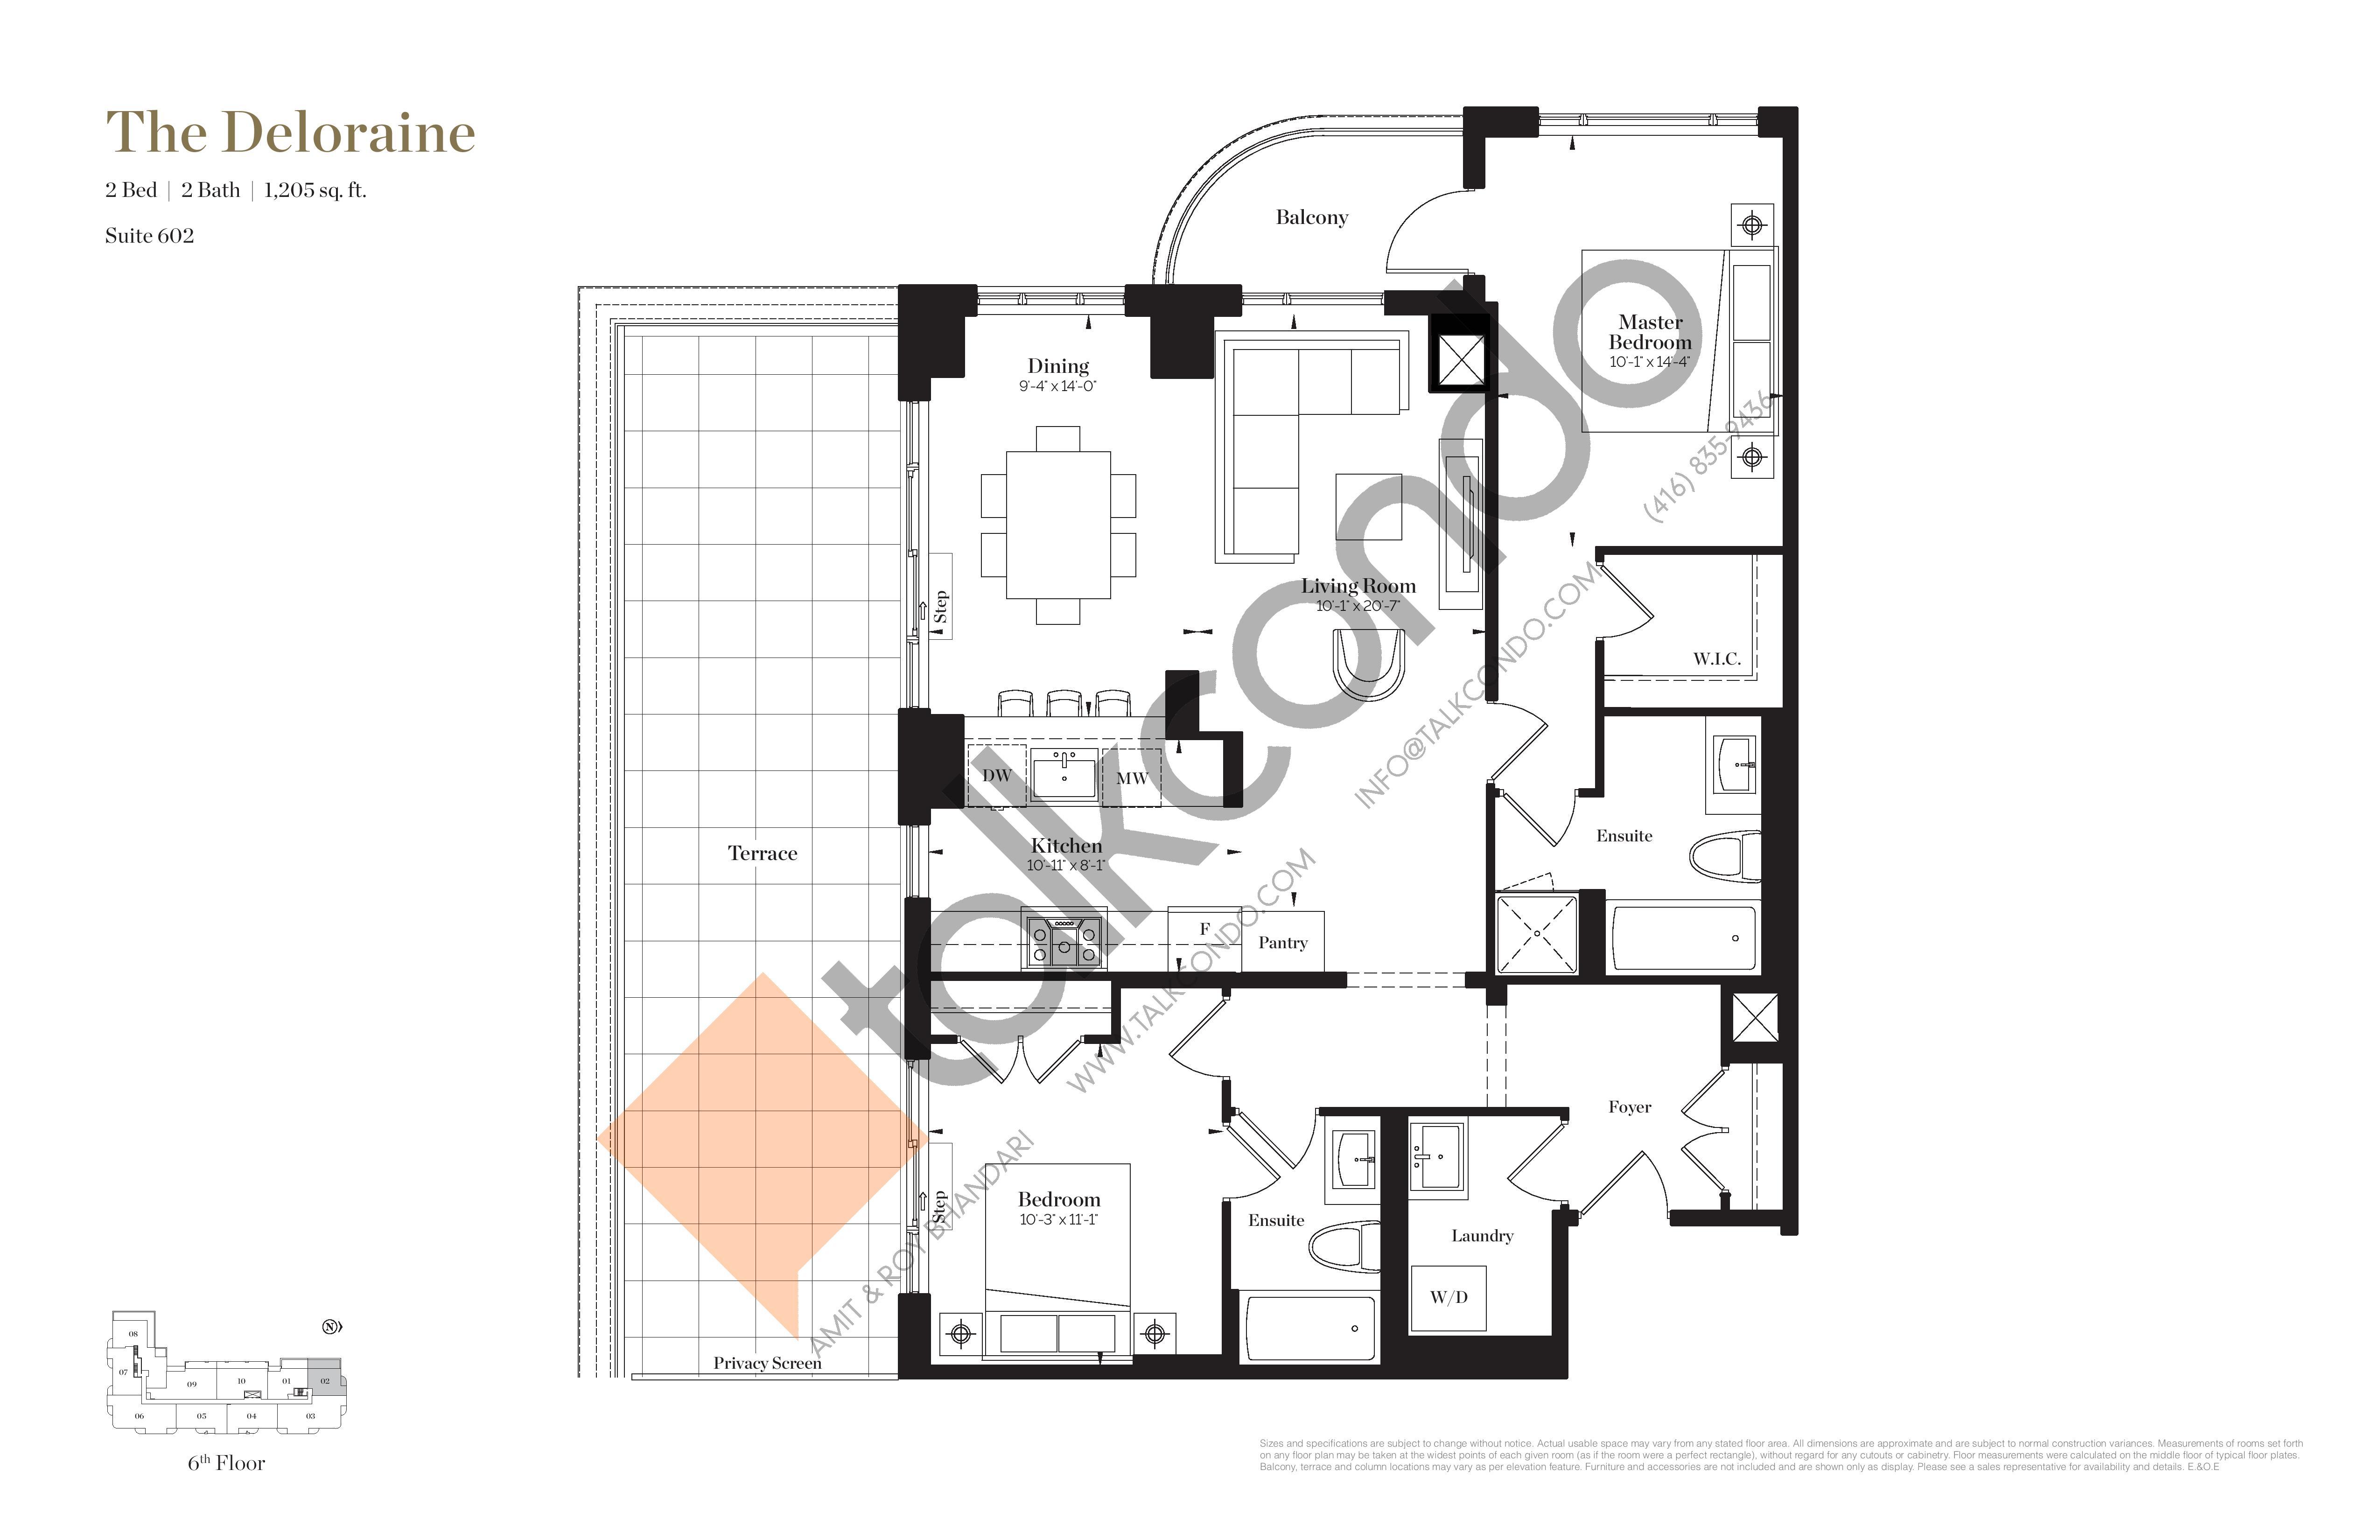 The Deloraine Floor Plan at Empire Maven Condos - 1205 sq.ft